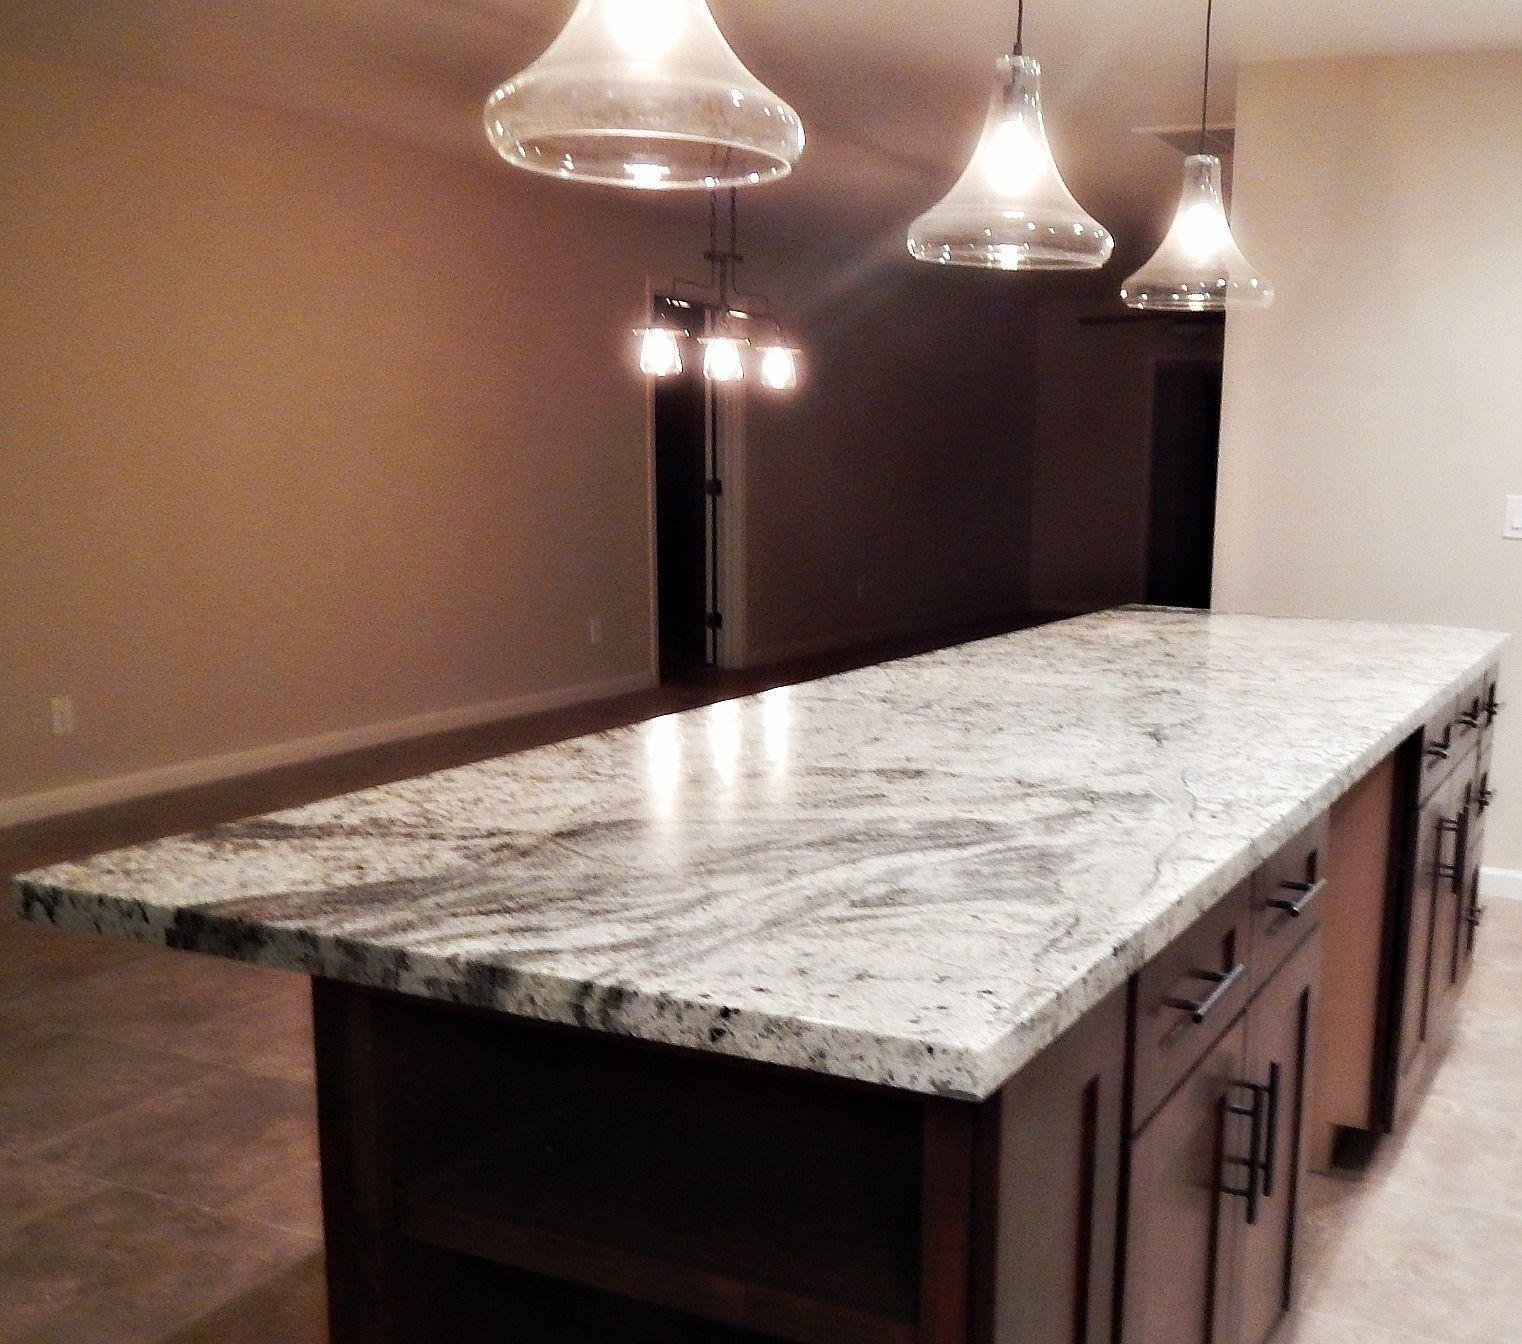 Attractive Kitchen Island Remodel With Bianco Antico Granite And Flat Polish Edge.  (602) 358